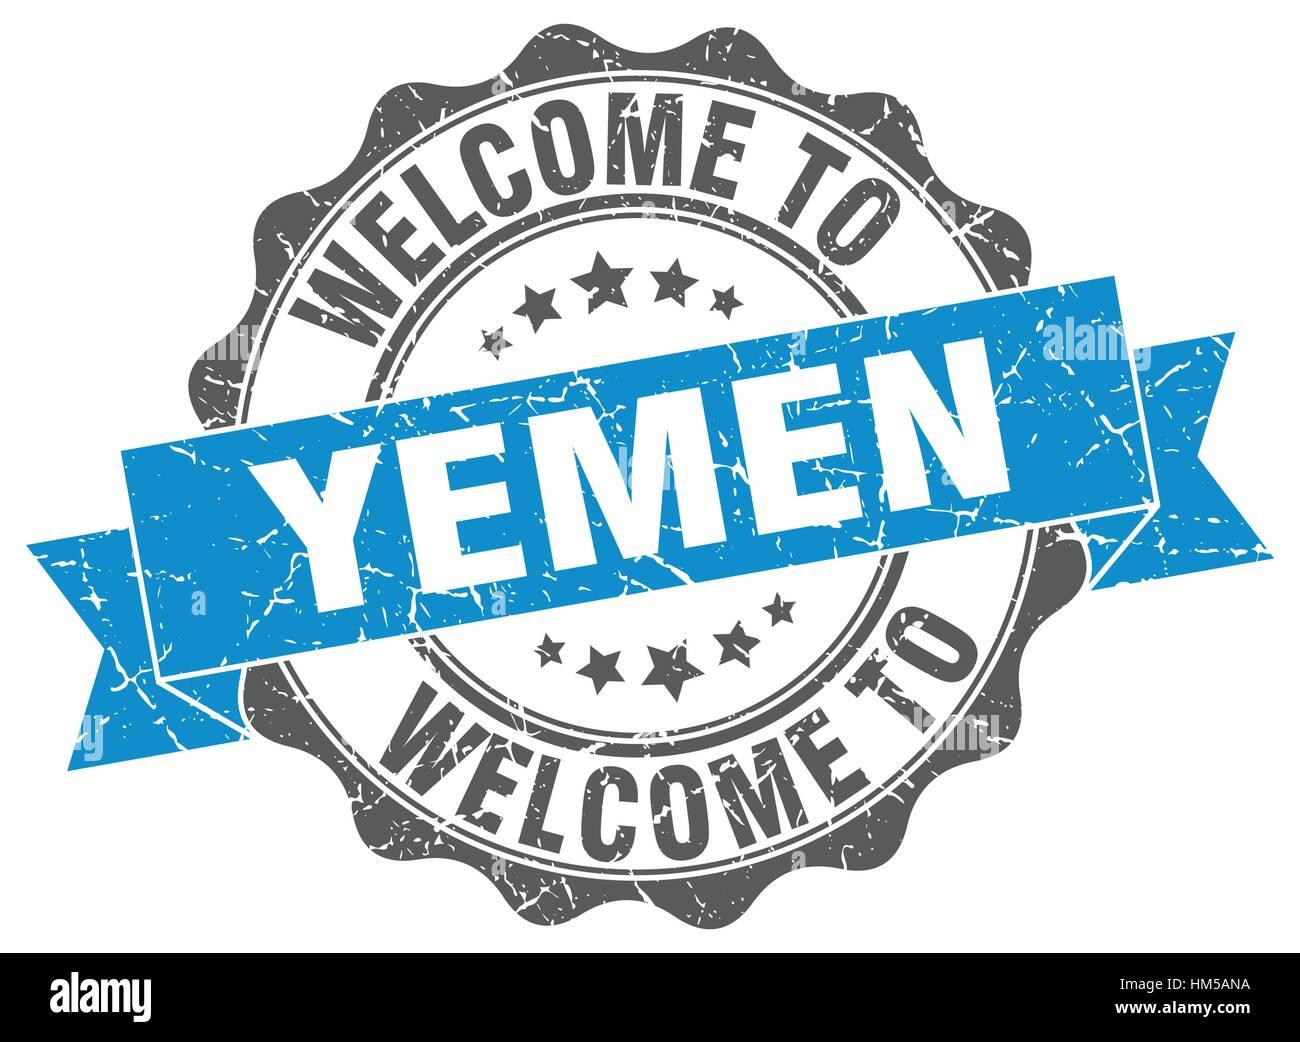 Yemen round ribbon seal - Stock Vector